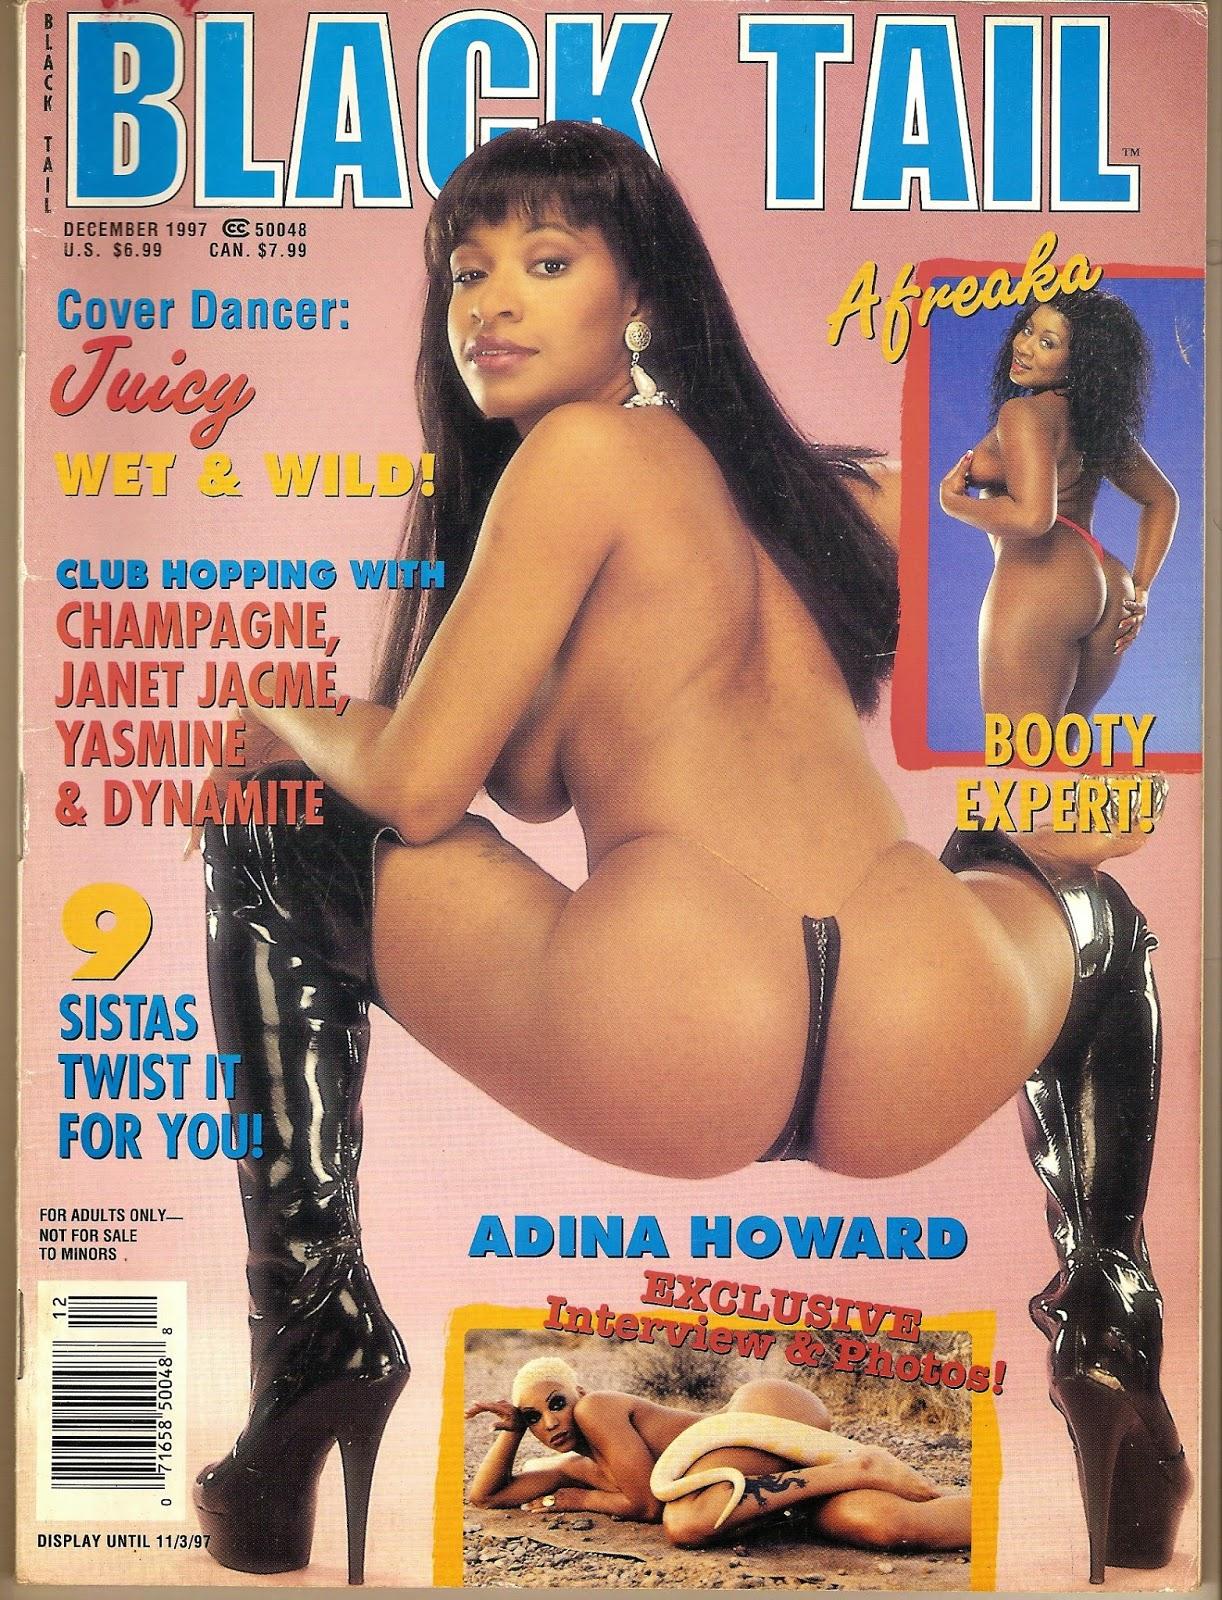 dynamite black tail porn - Black Tail December 1997